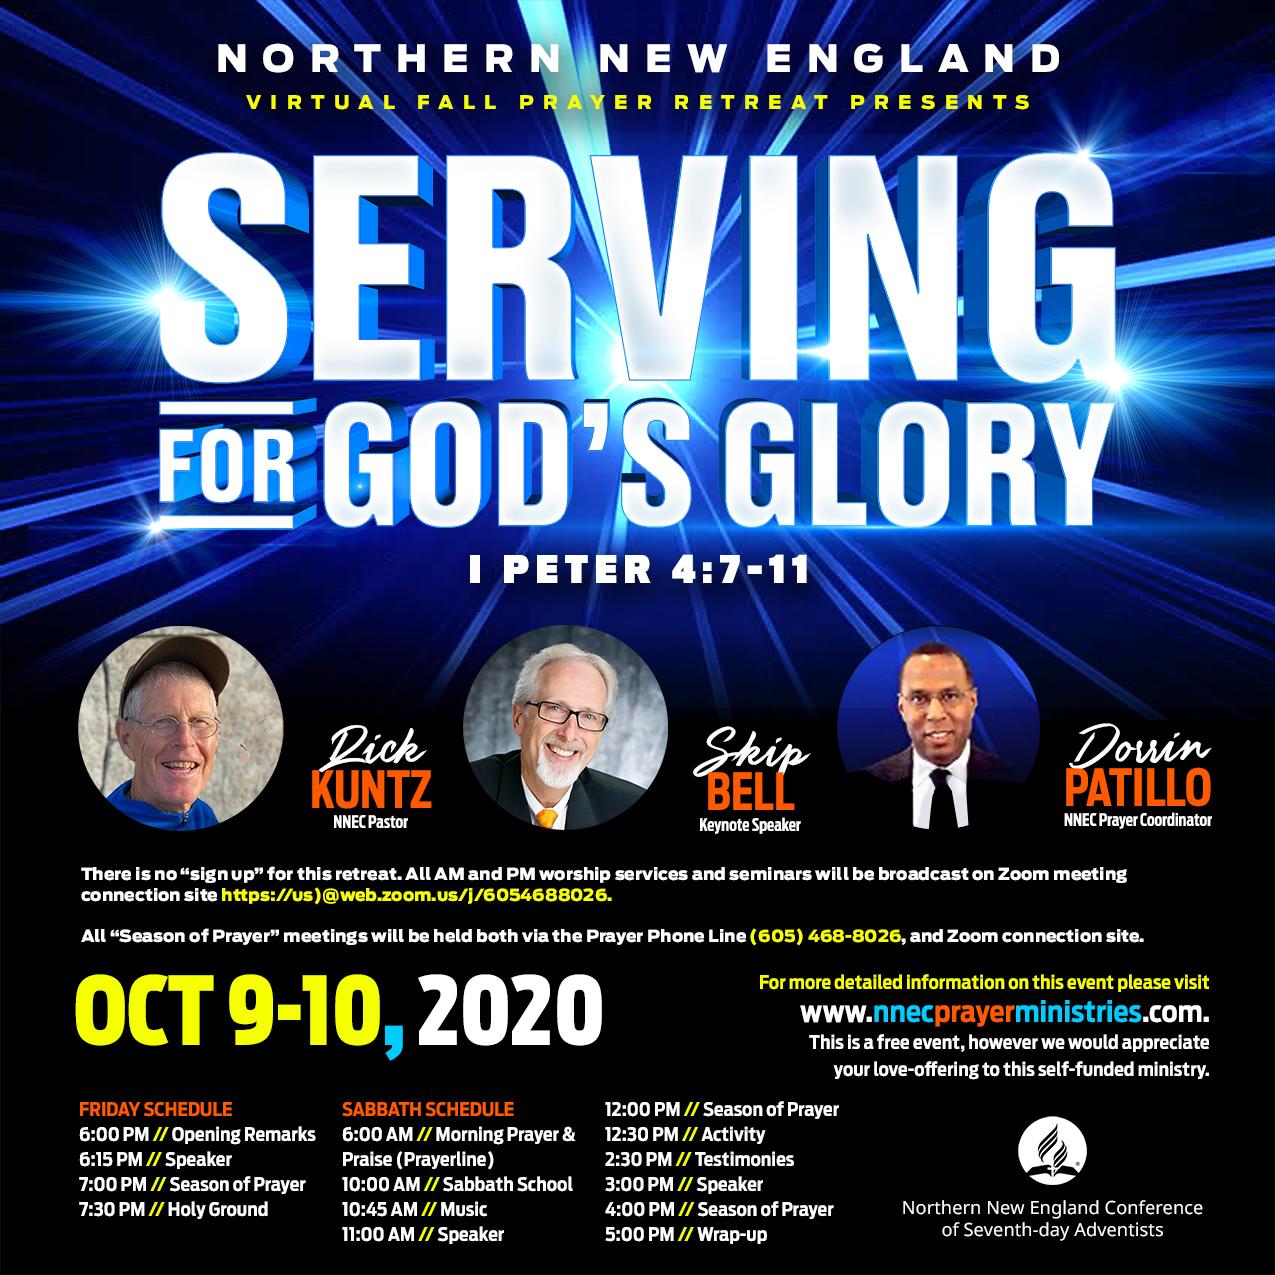 Serving for God's Glory - Social Promo